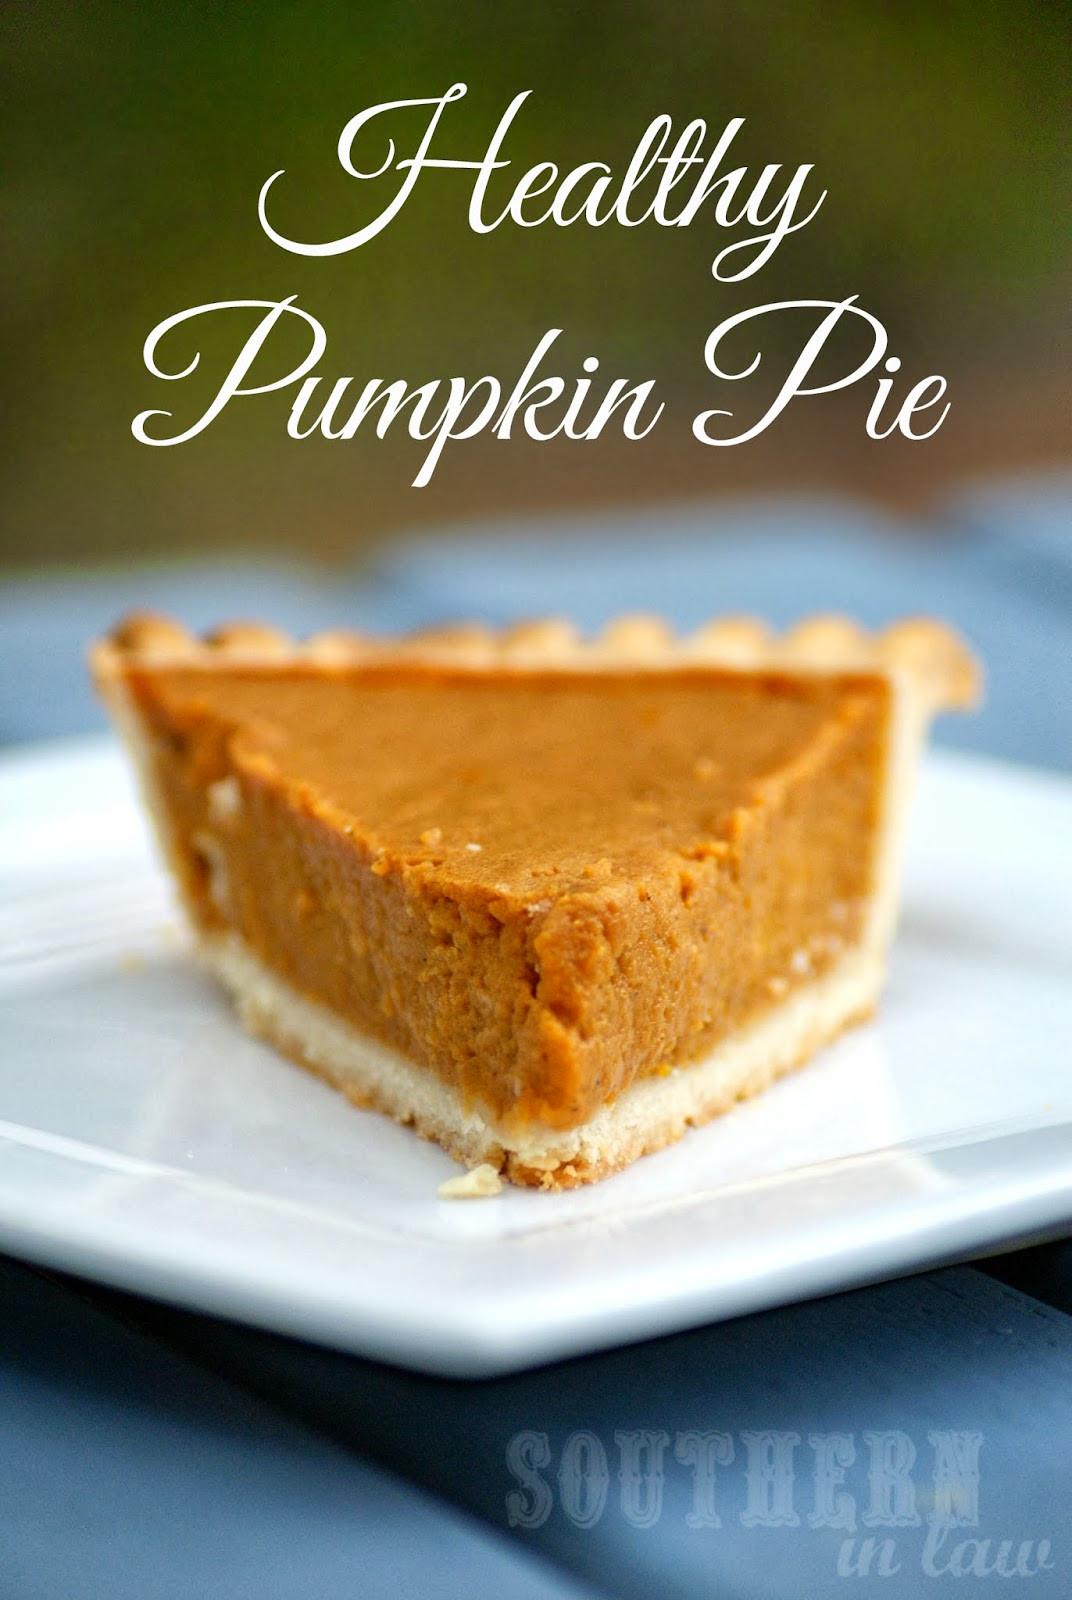 Healthy Pumpkin Pie Recipes  Southern In Law Healthy Pumpkin Pie Recipe